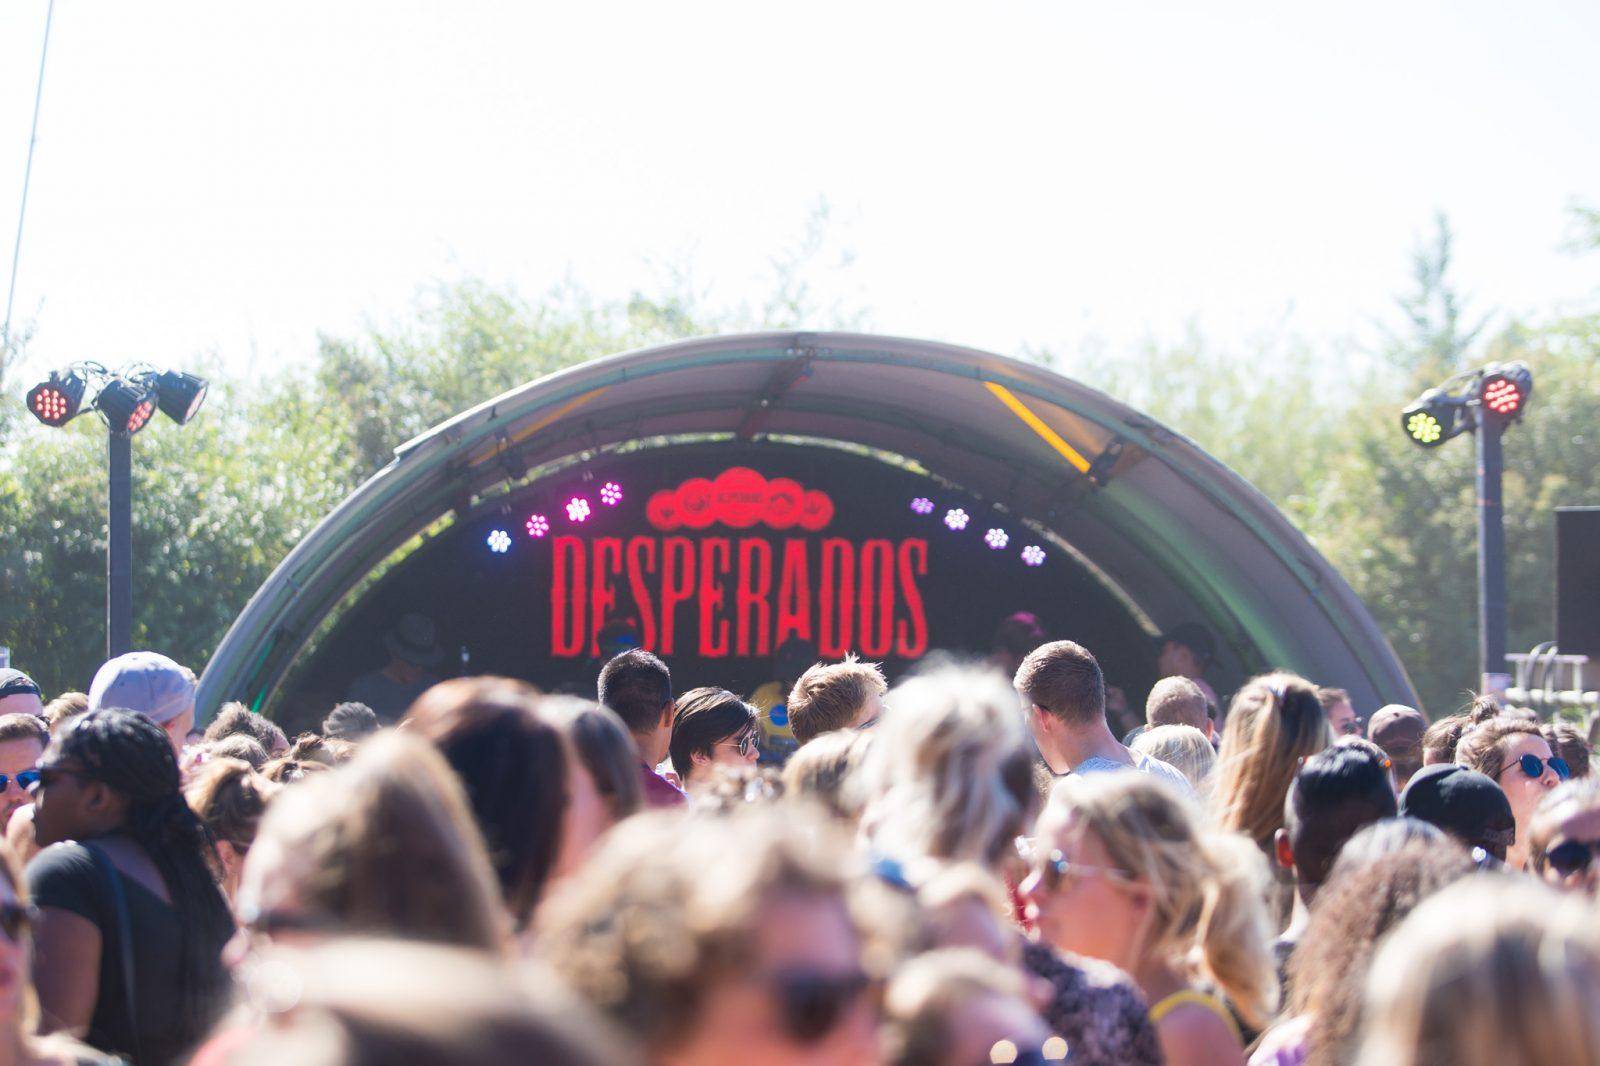 Triomf - Desperados - Vunzige Deuntjes 2018